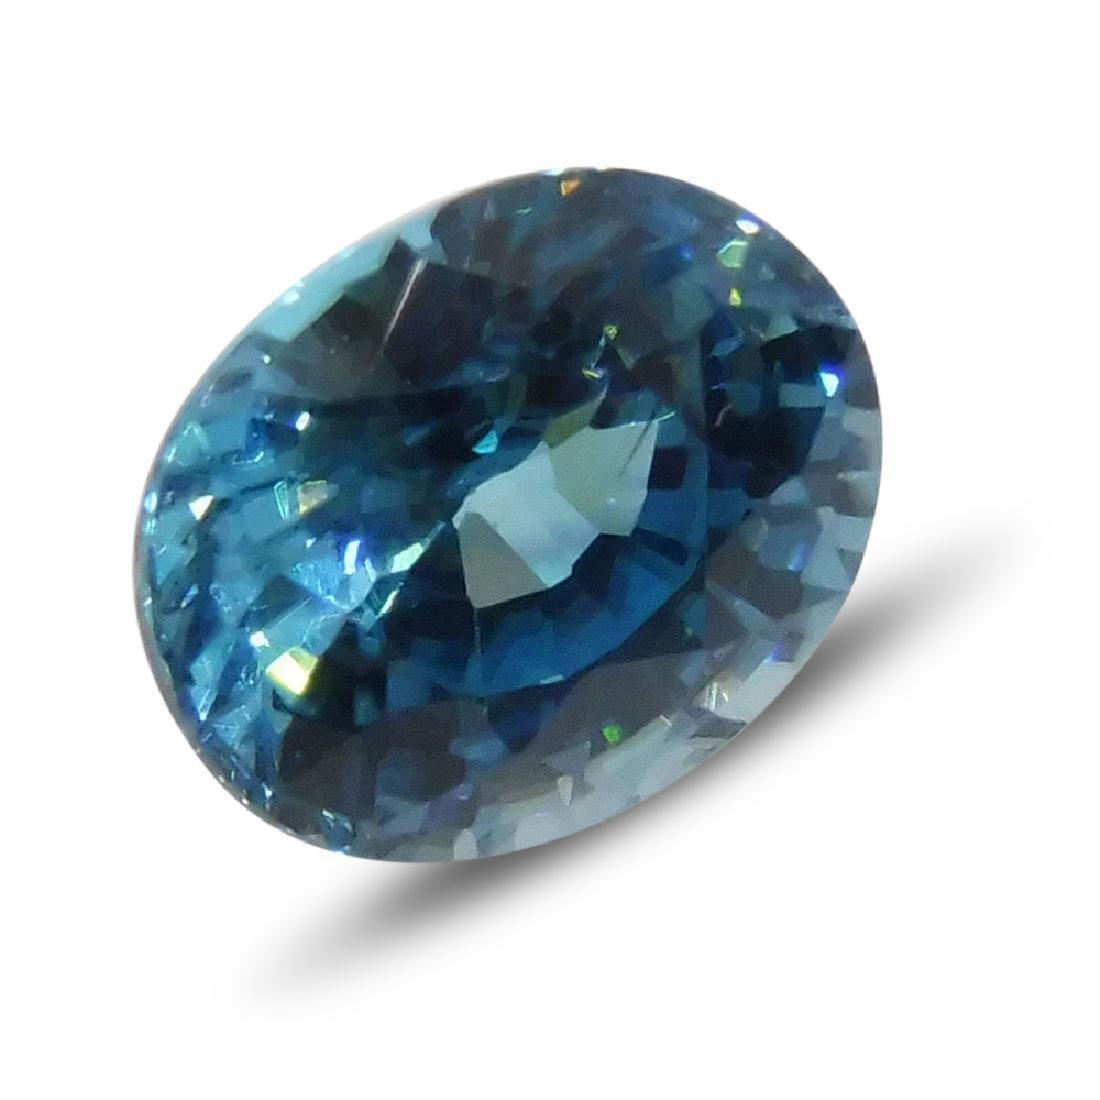 4.21 Carat Loose Oval Blue Zircon - 2